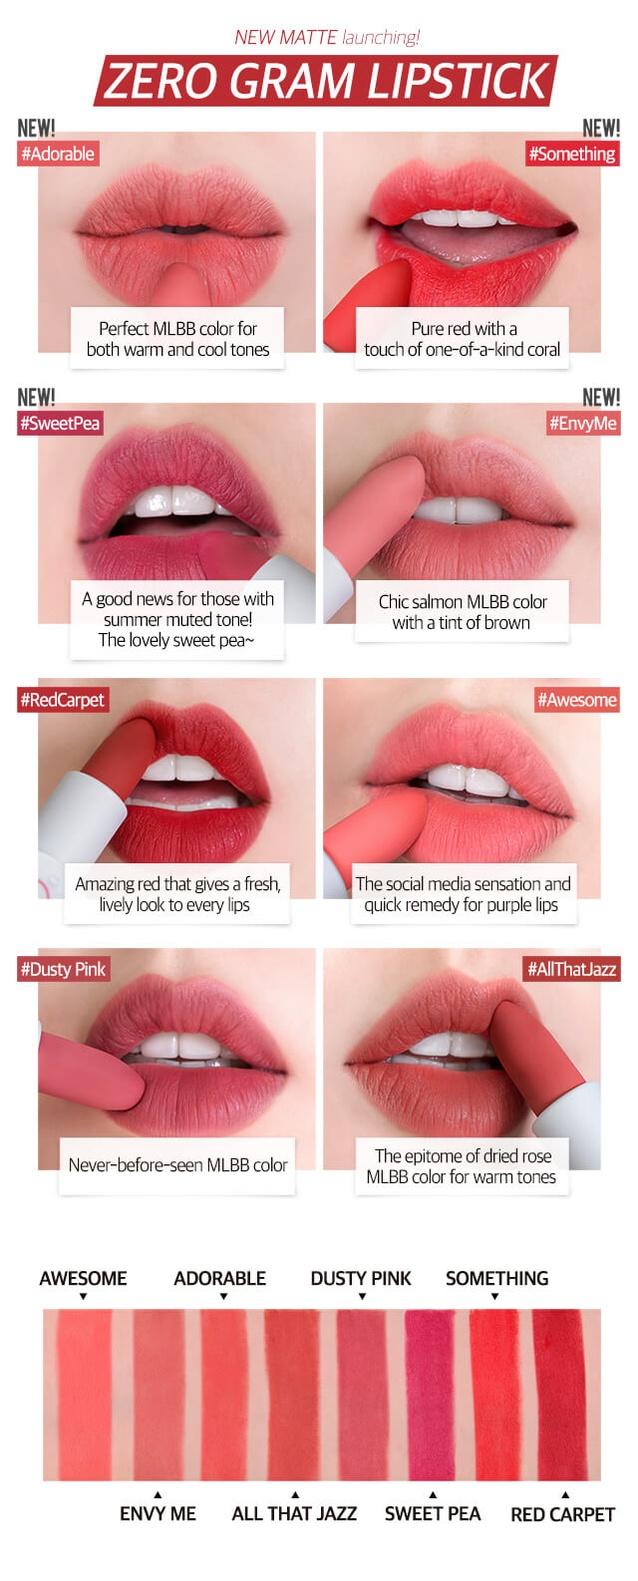 Brand: ROMAND - Romand Zerogram Matt Lipstick